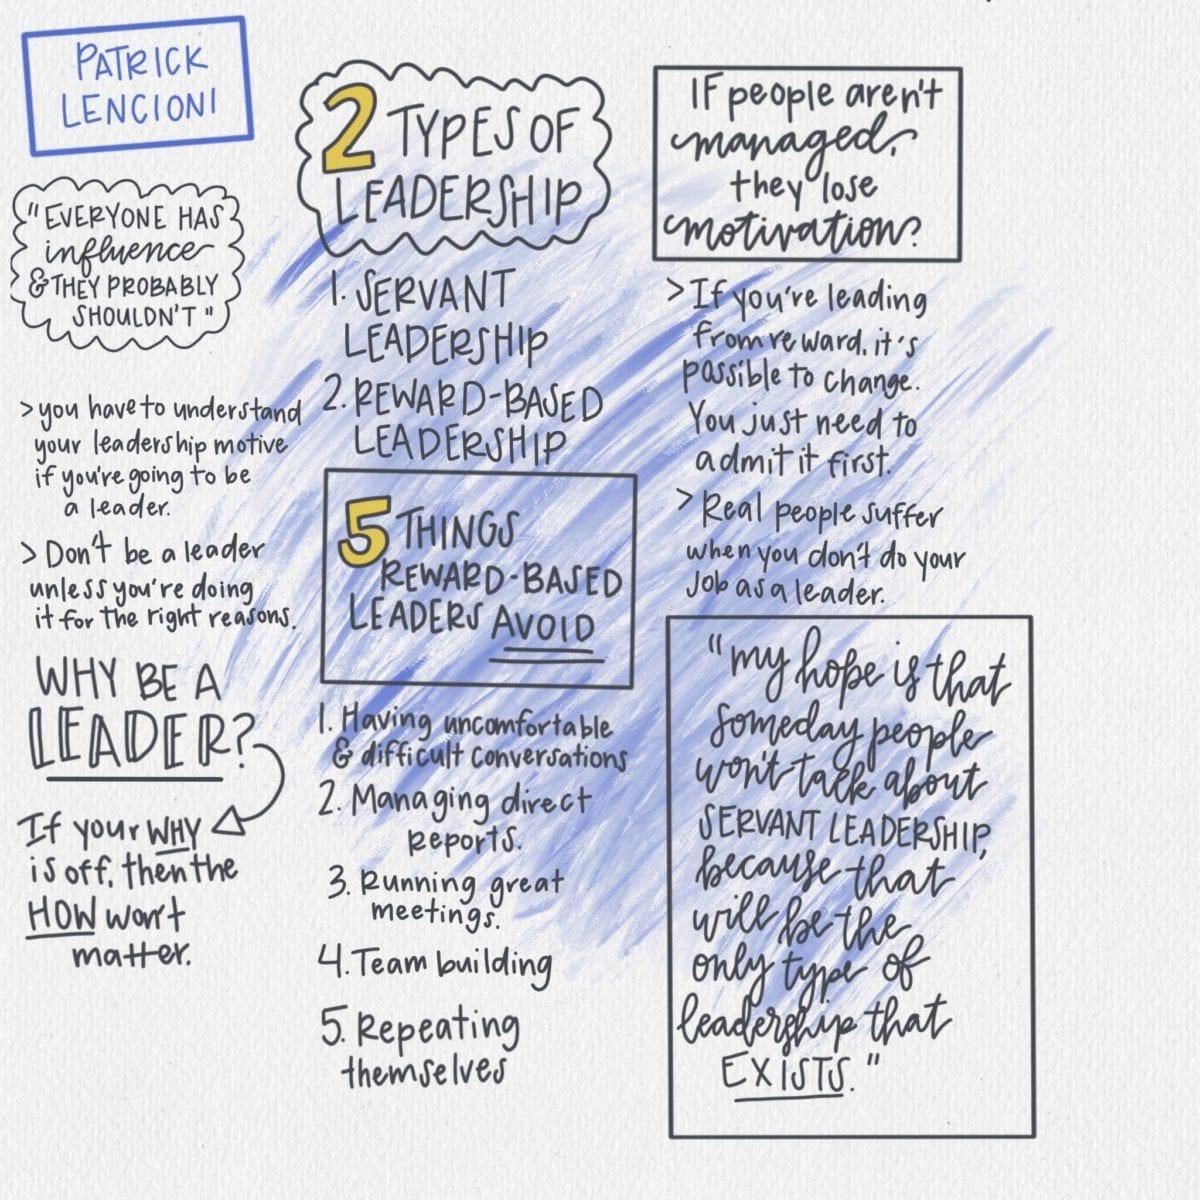 The Motive-Patrick-Lencioni-Session-4-Illustrative-Summary